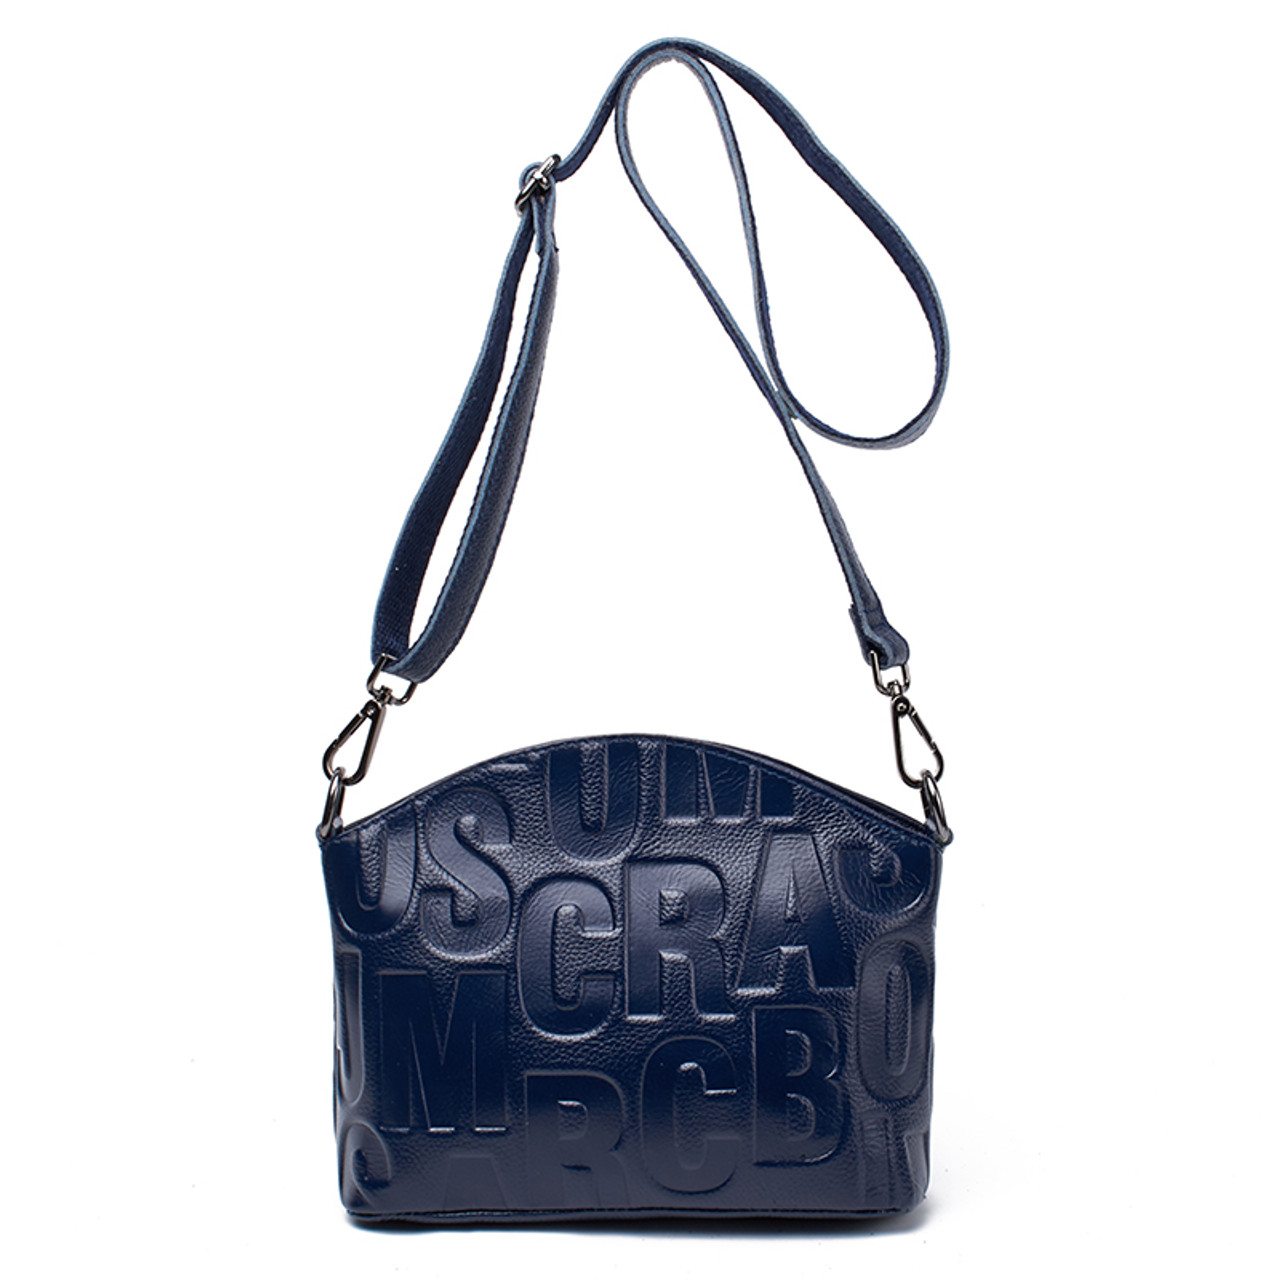 0299c3974c ... Brand Fashion Bags genuine leather bag elegant handbag Luxury Style  women leather handbags bolsa feminina Many ...